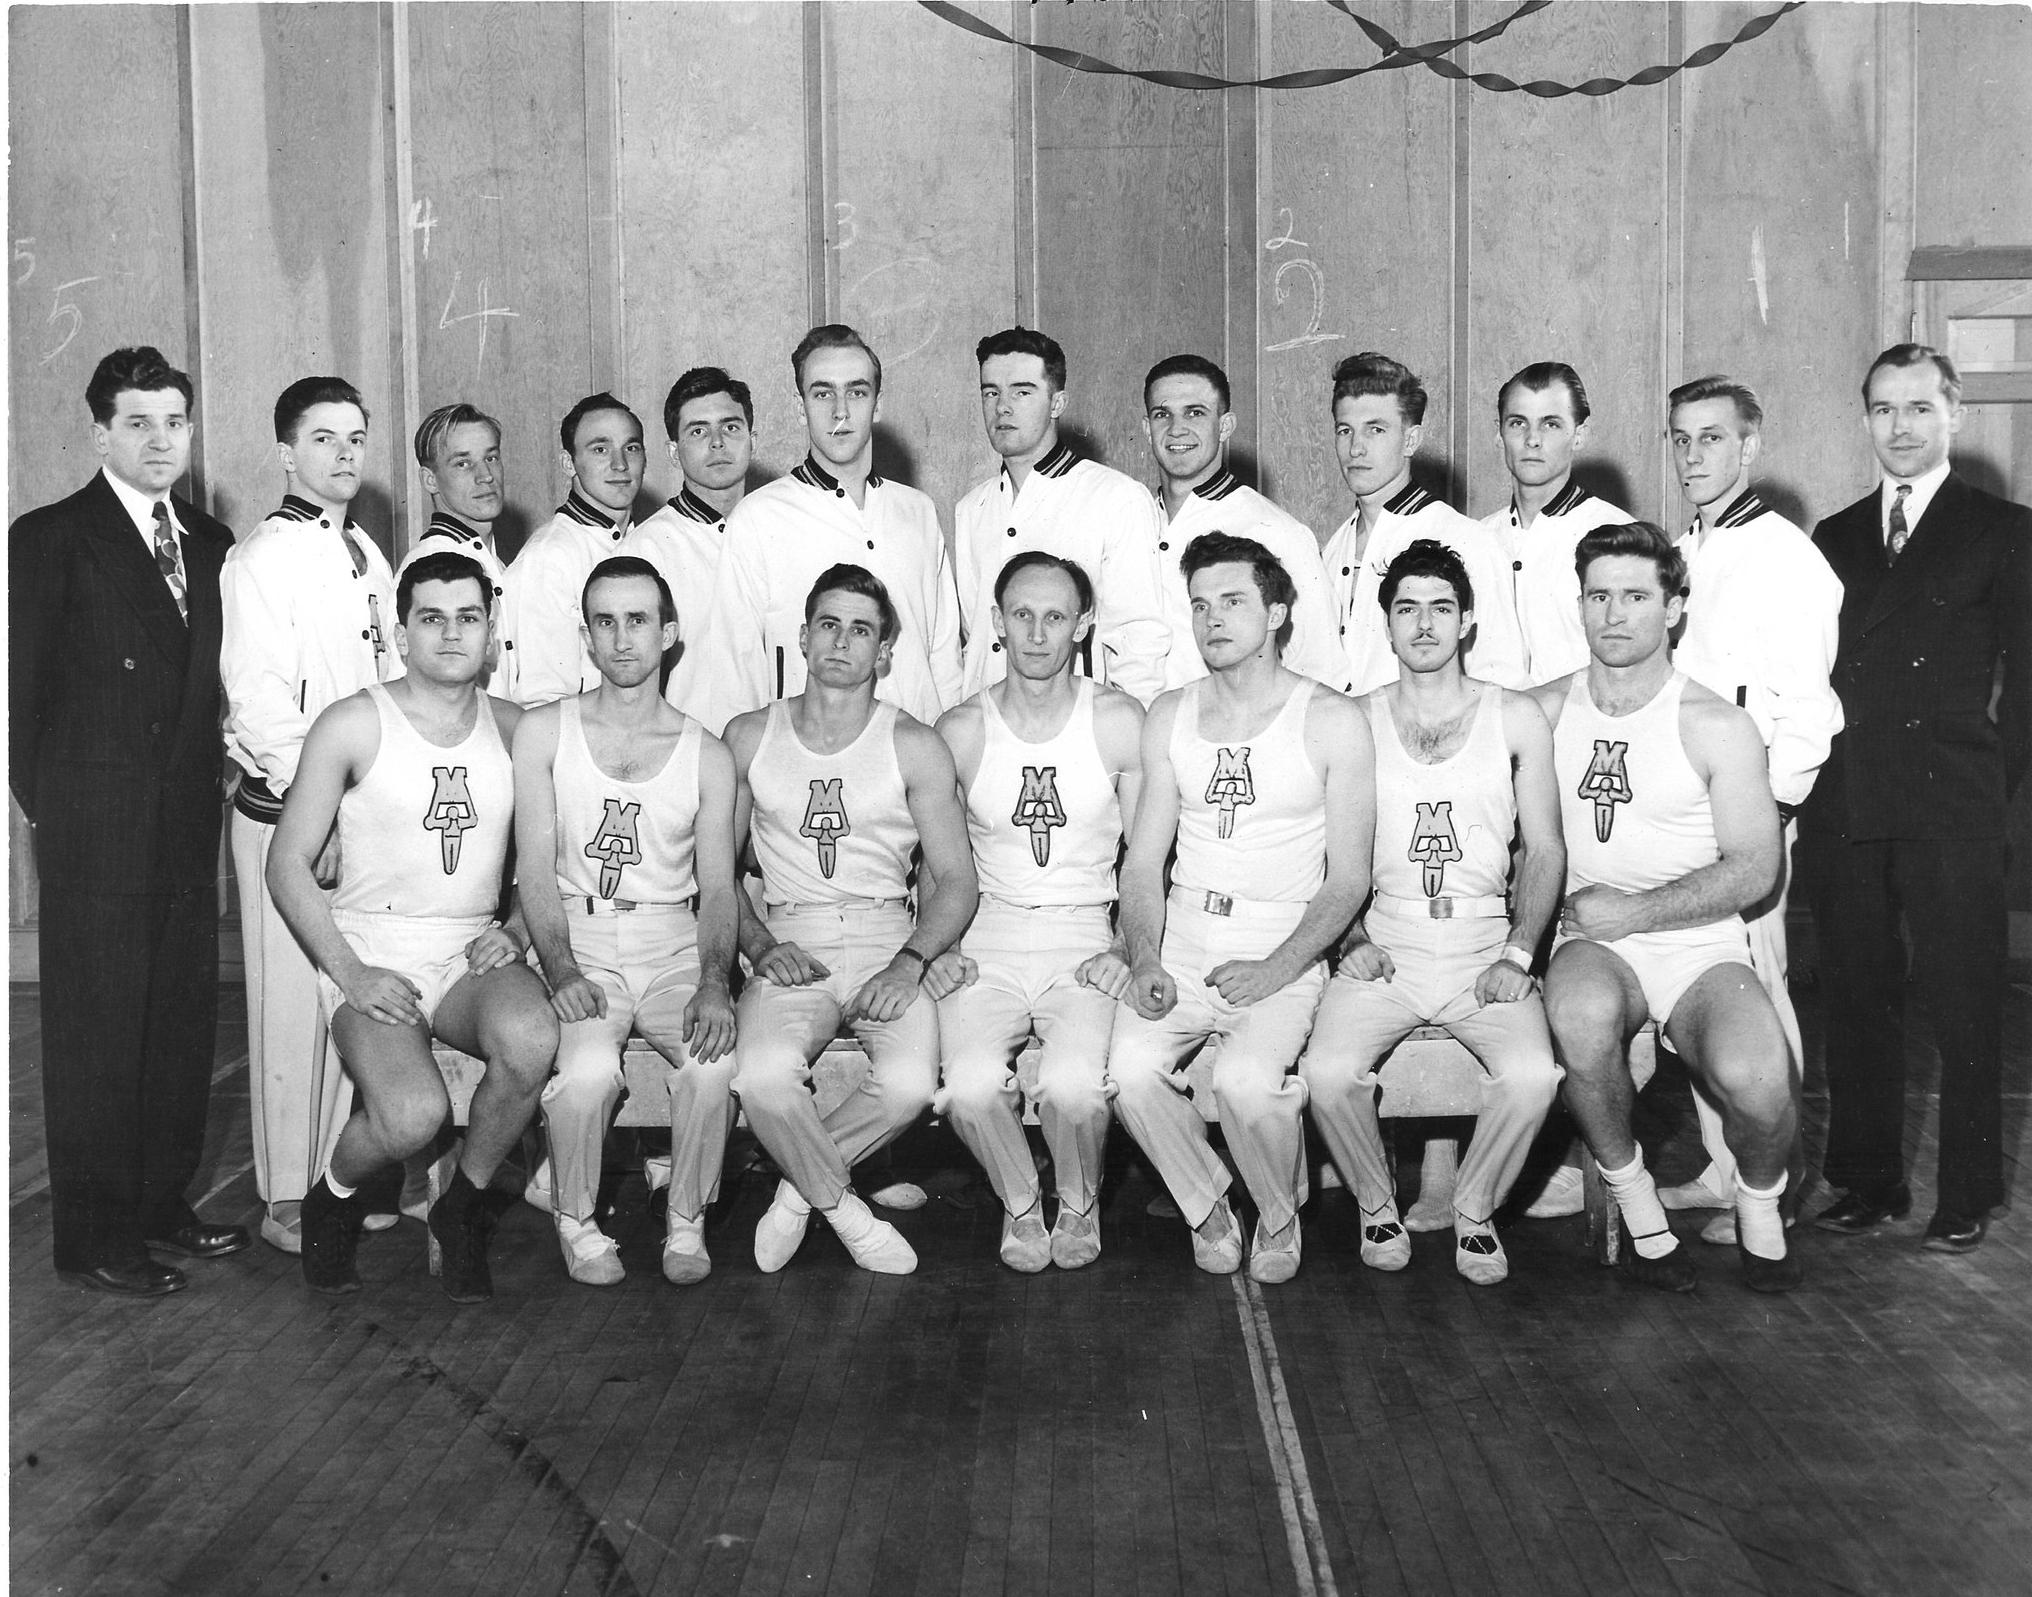 1951 Maryland Men's Gymnastics Team